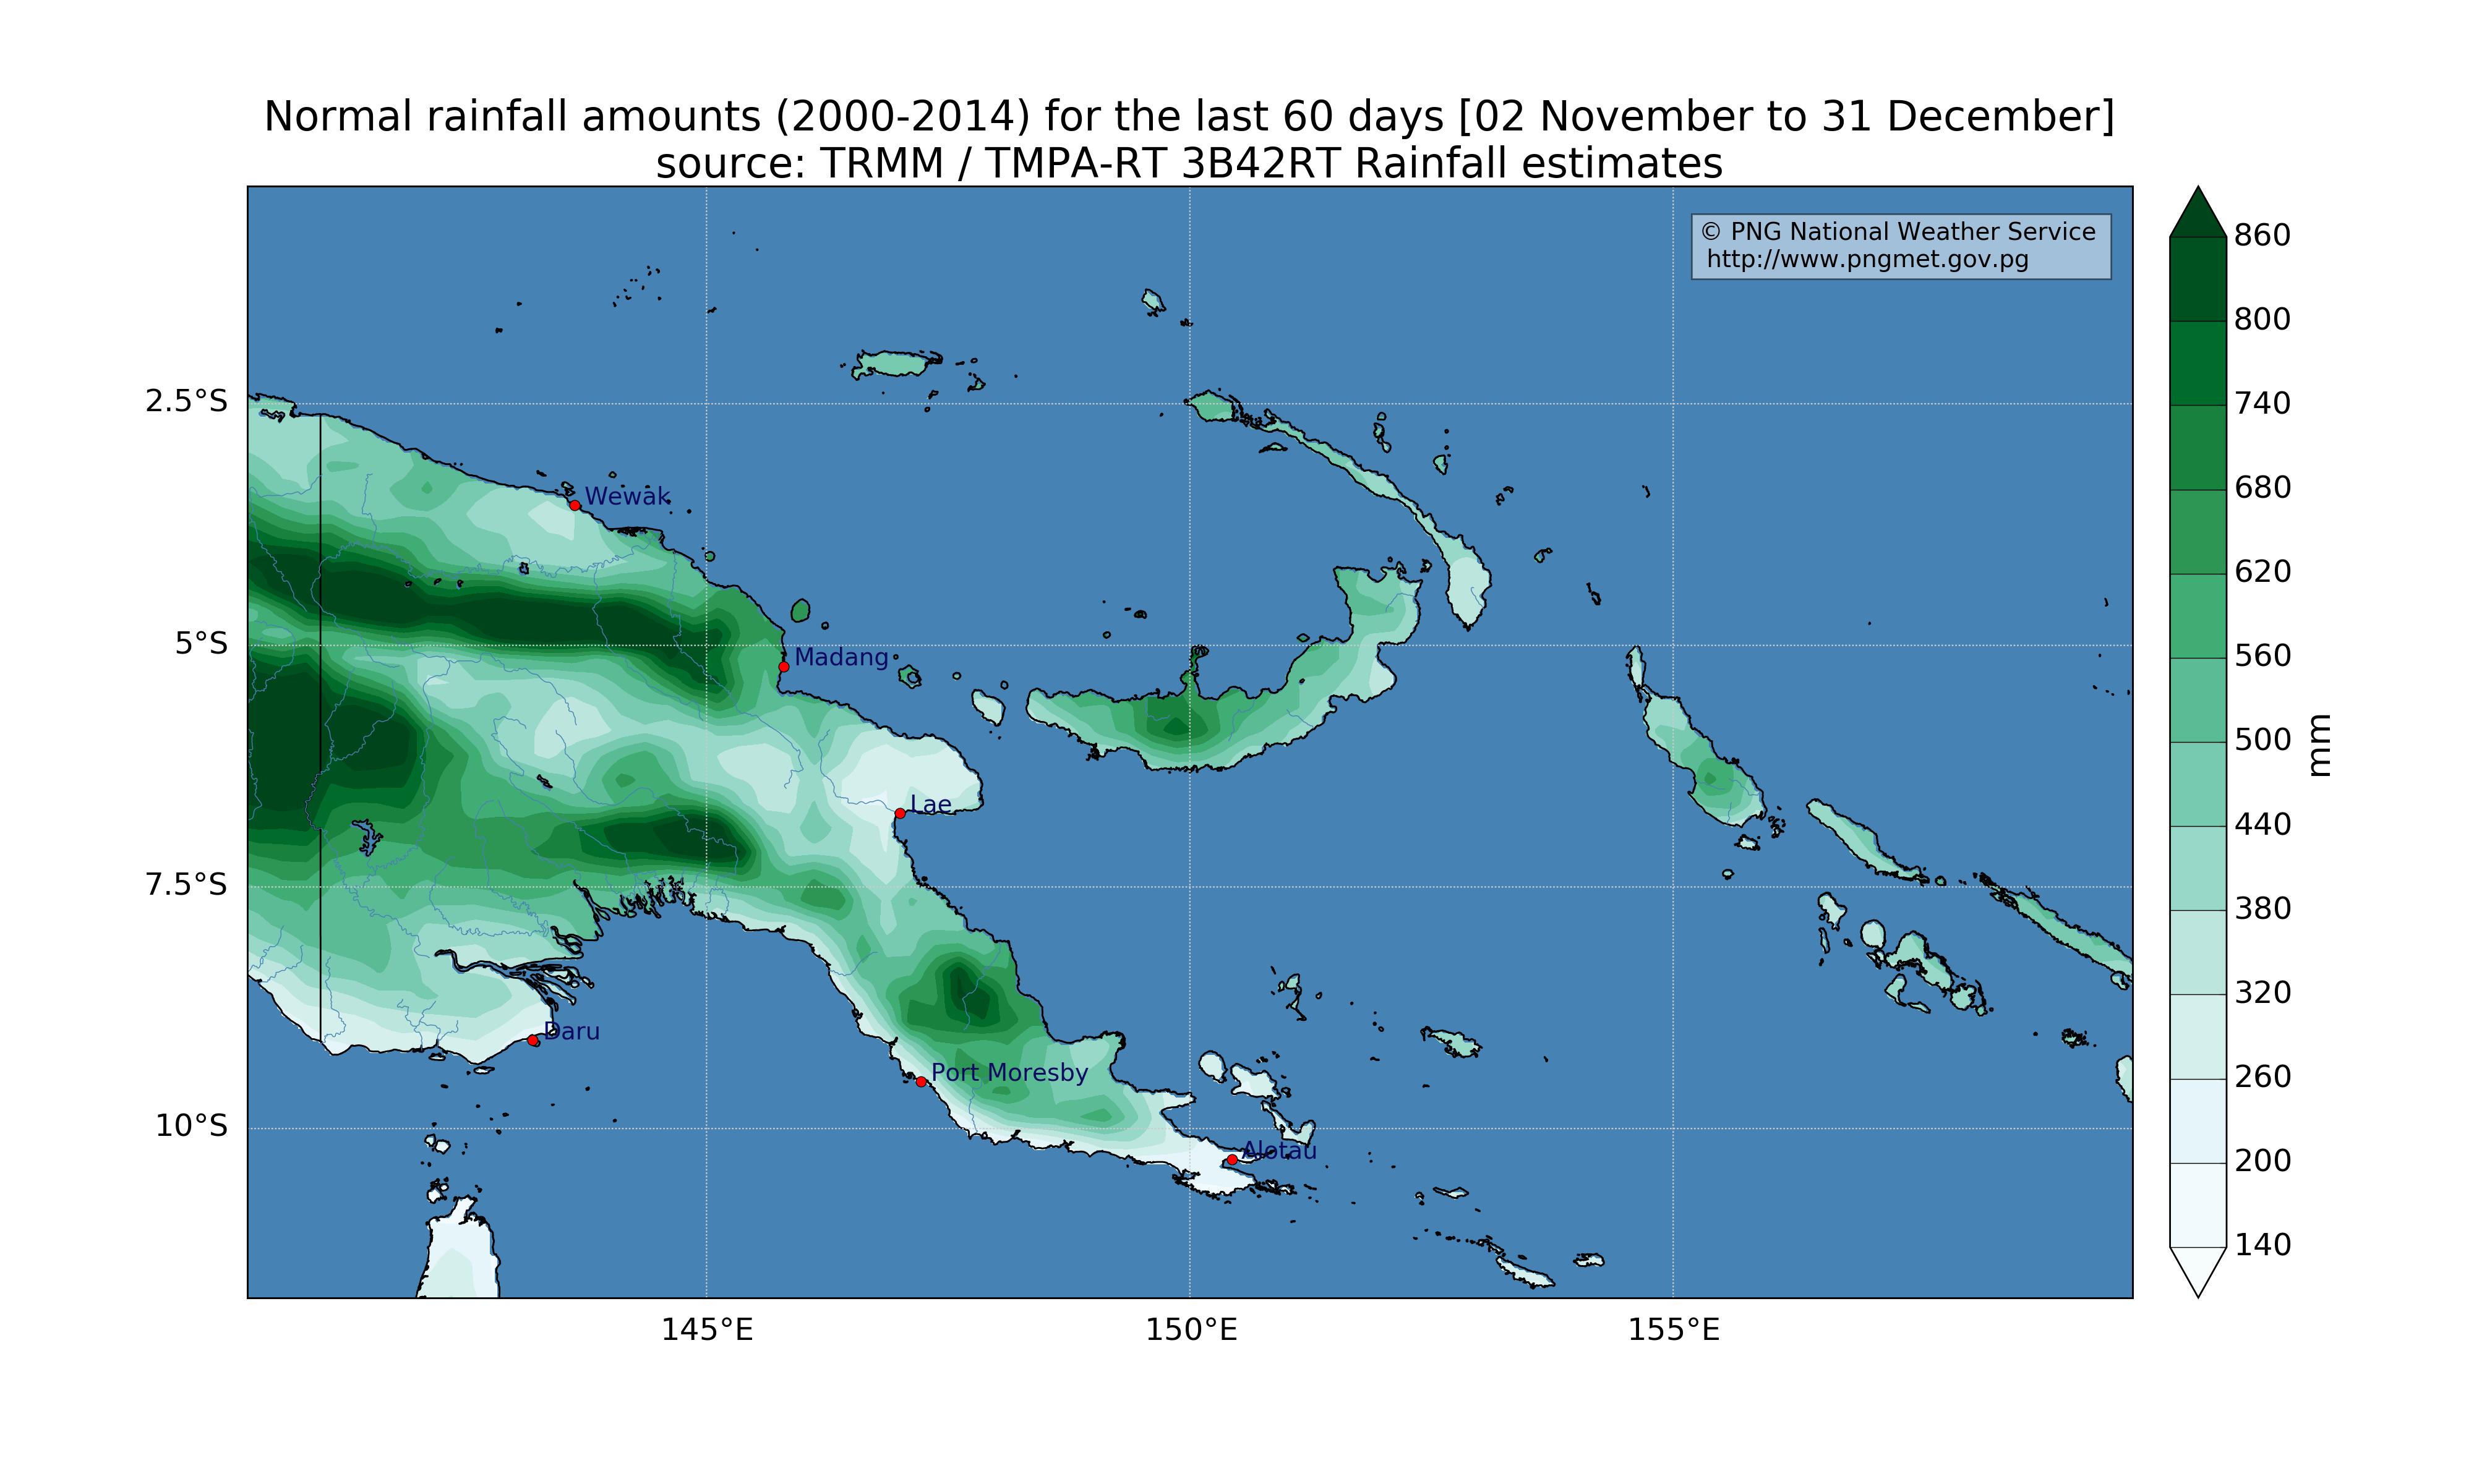 climatology (2000 - 2014 average) for the last 60 days